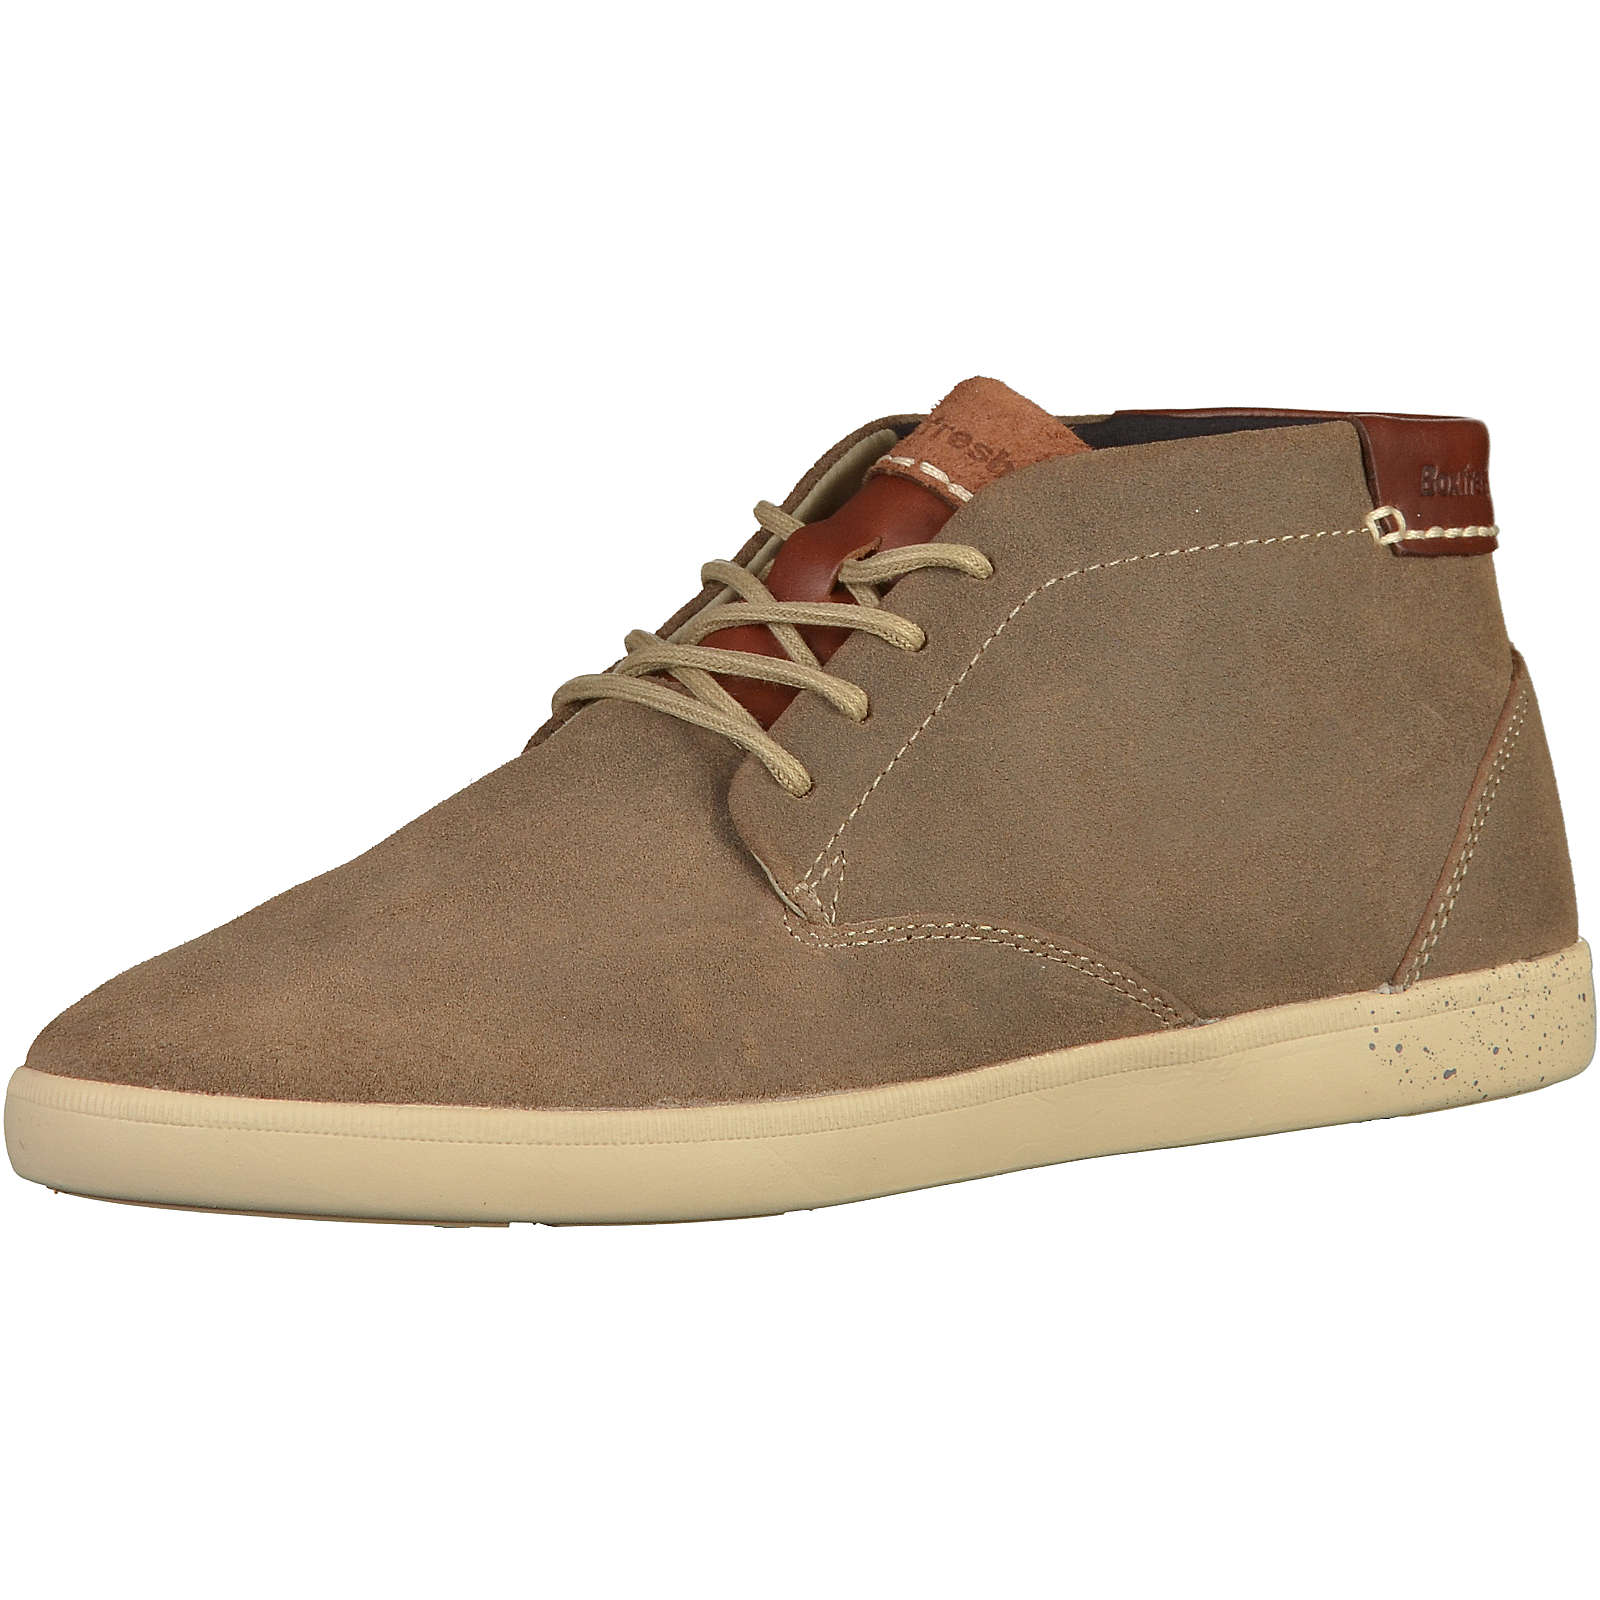 Boxfresh Sneakers braun Herren Gr. 44